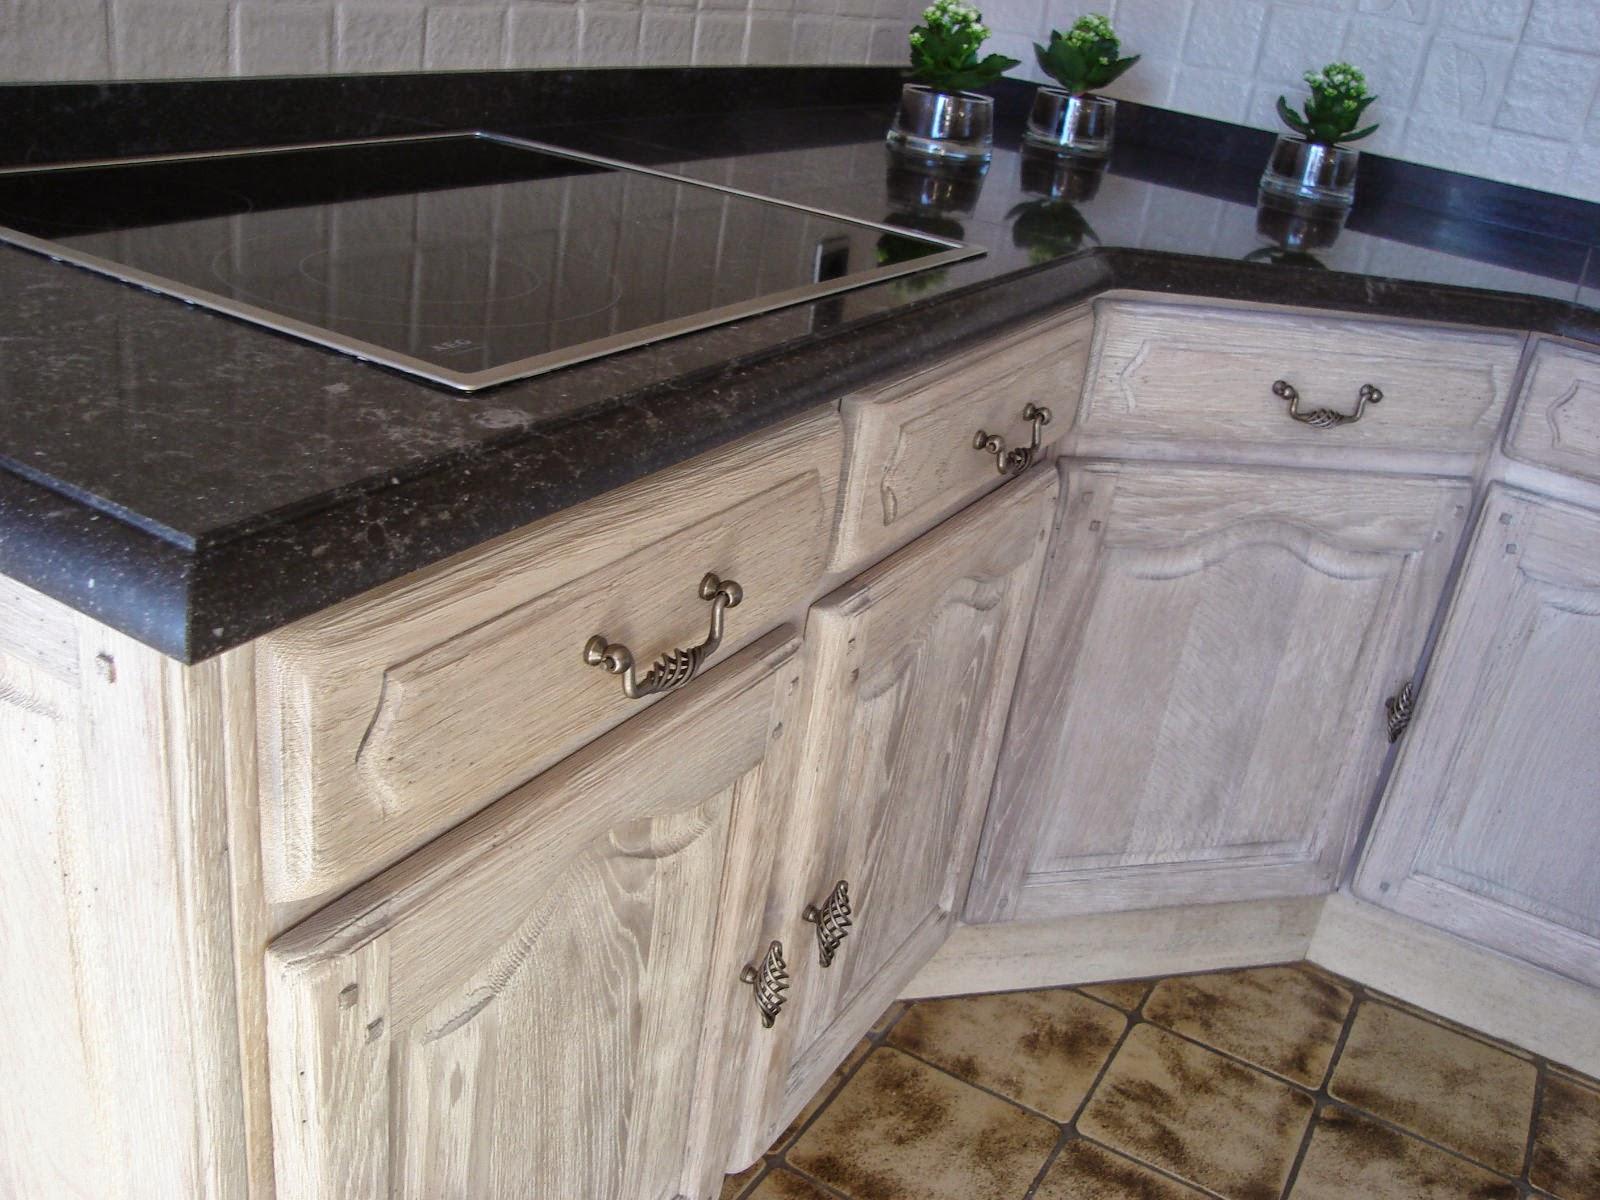 Eiken Keukenkast Verven : Eiken keuken verven bi belbin